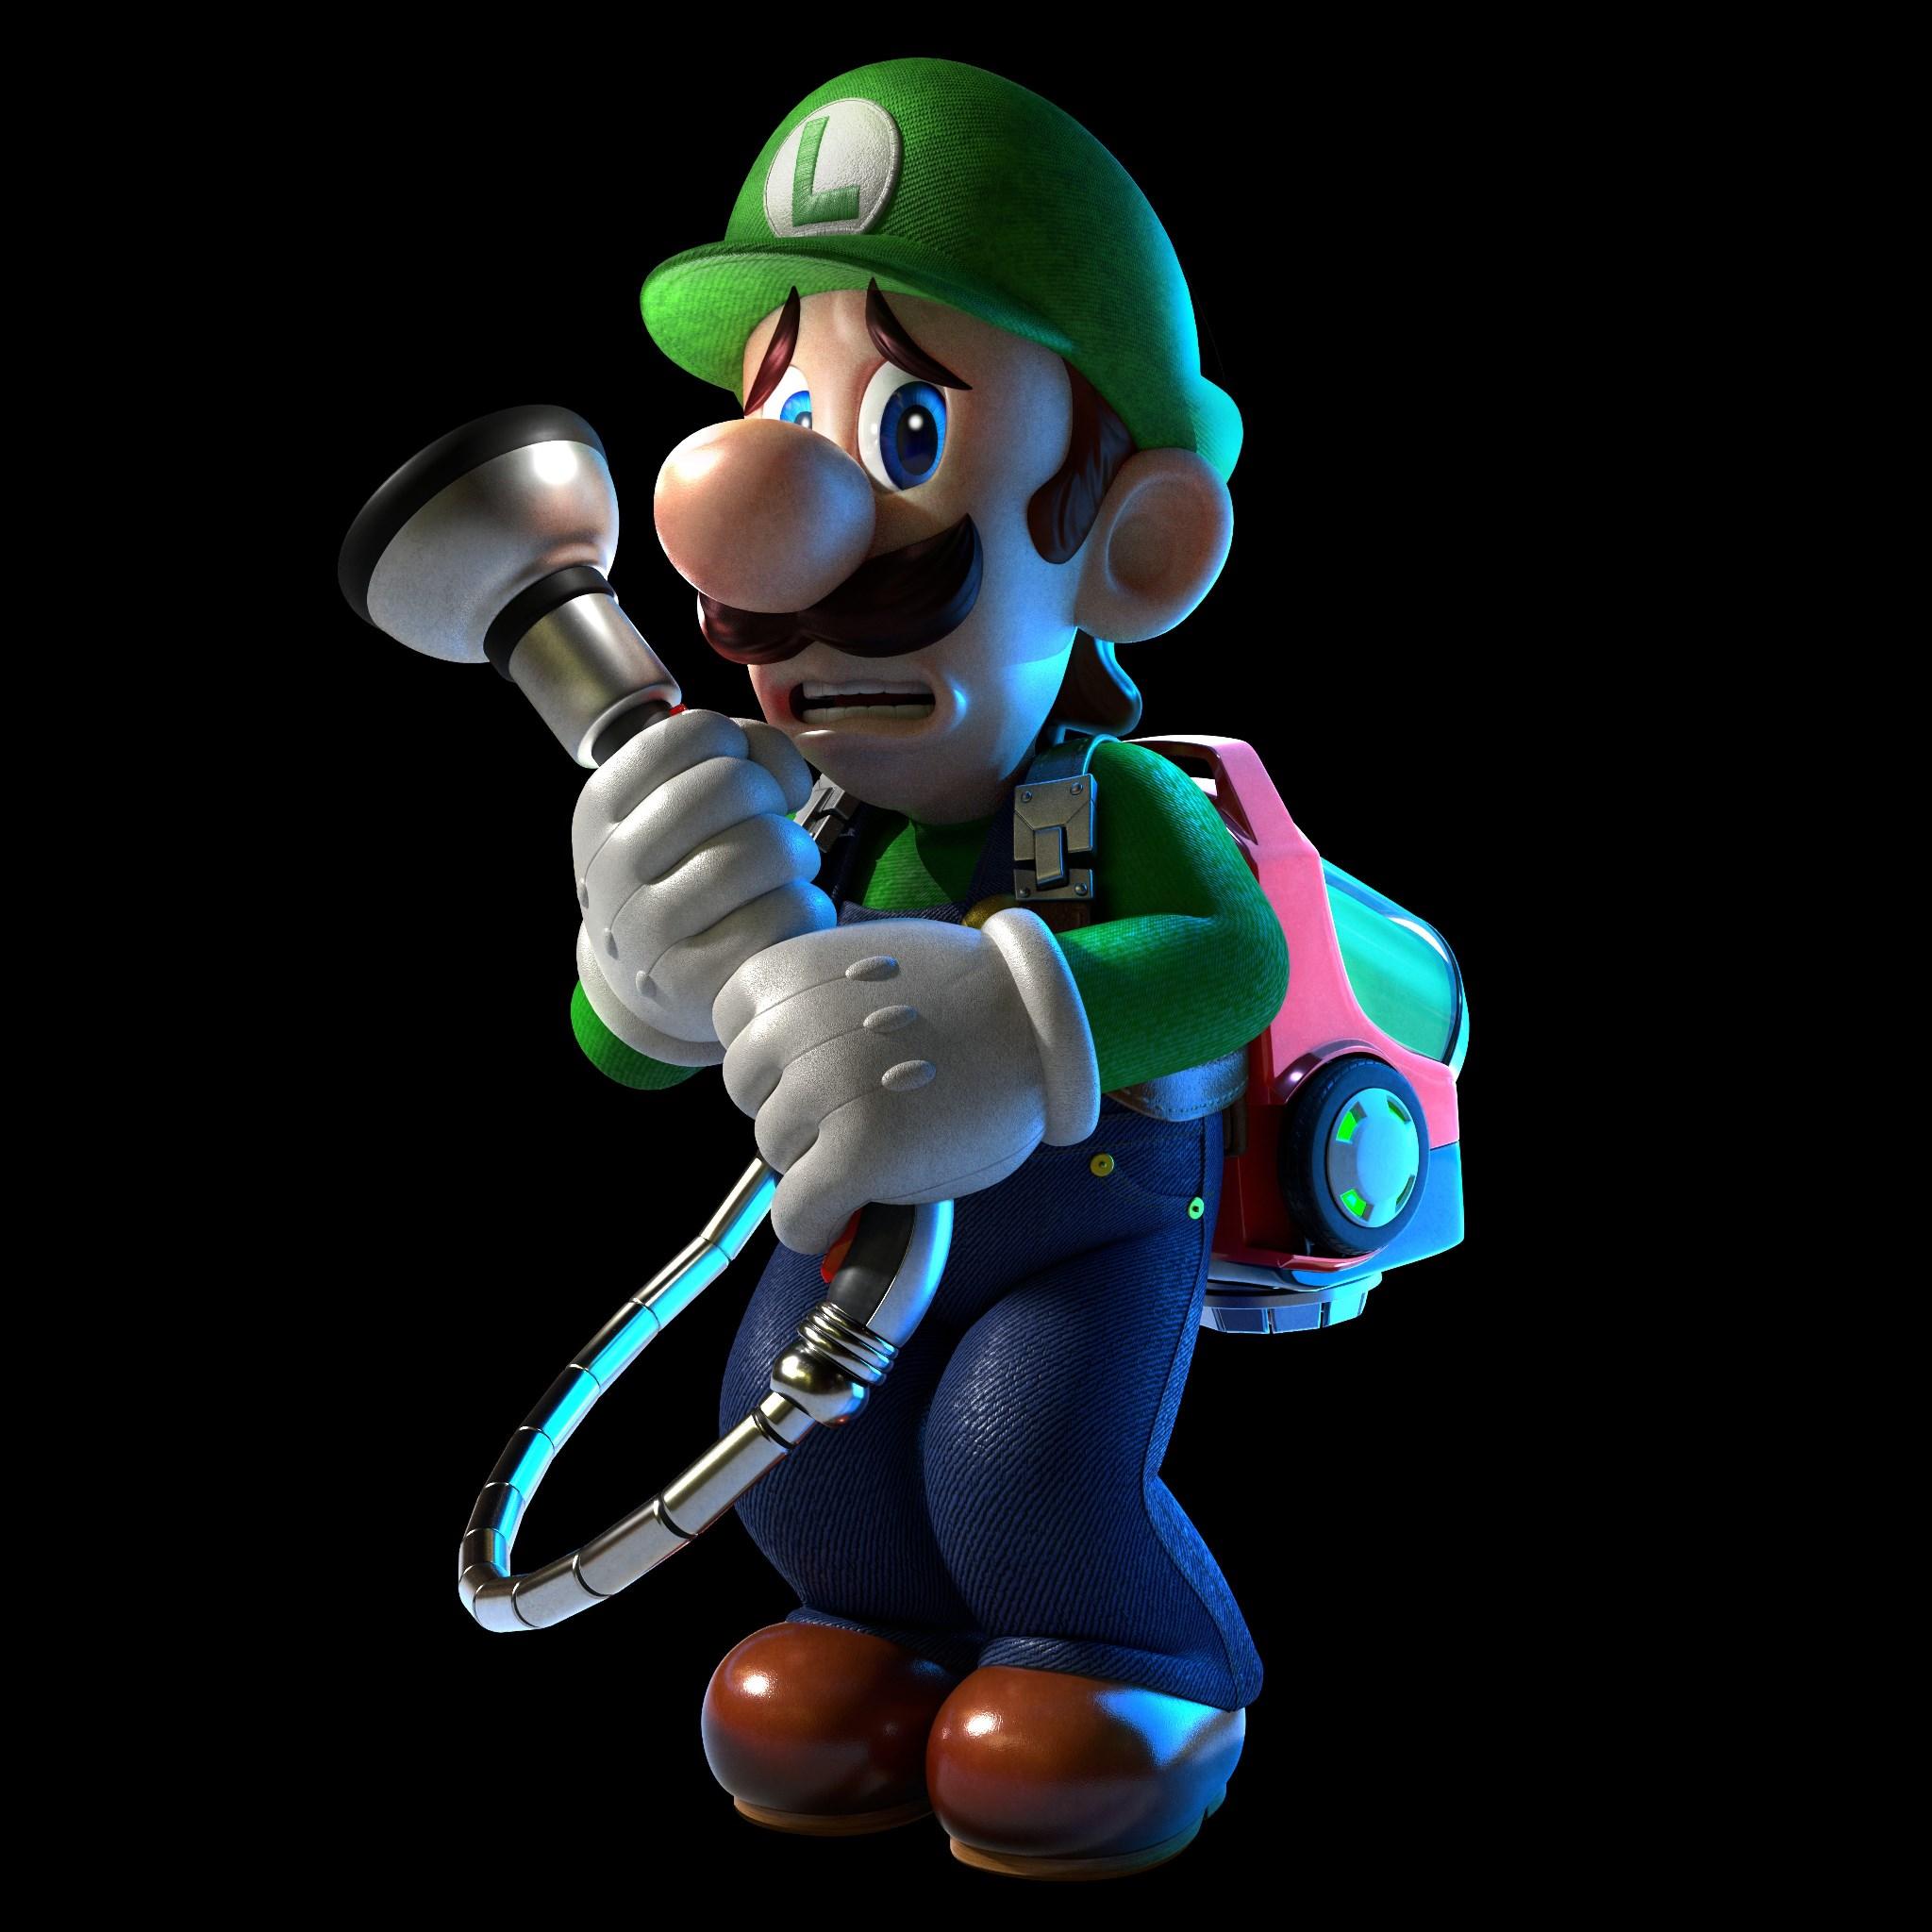 Luigi S Mansion 3 Boxart Screenshots Art Fact Sheet Nintendo